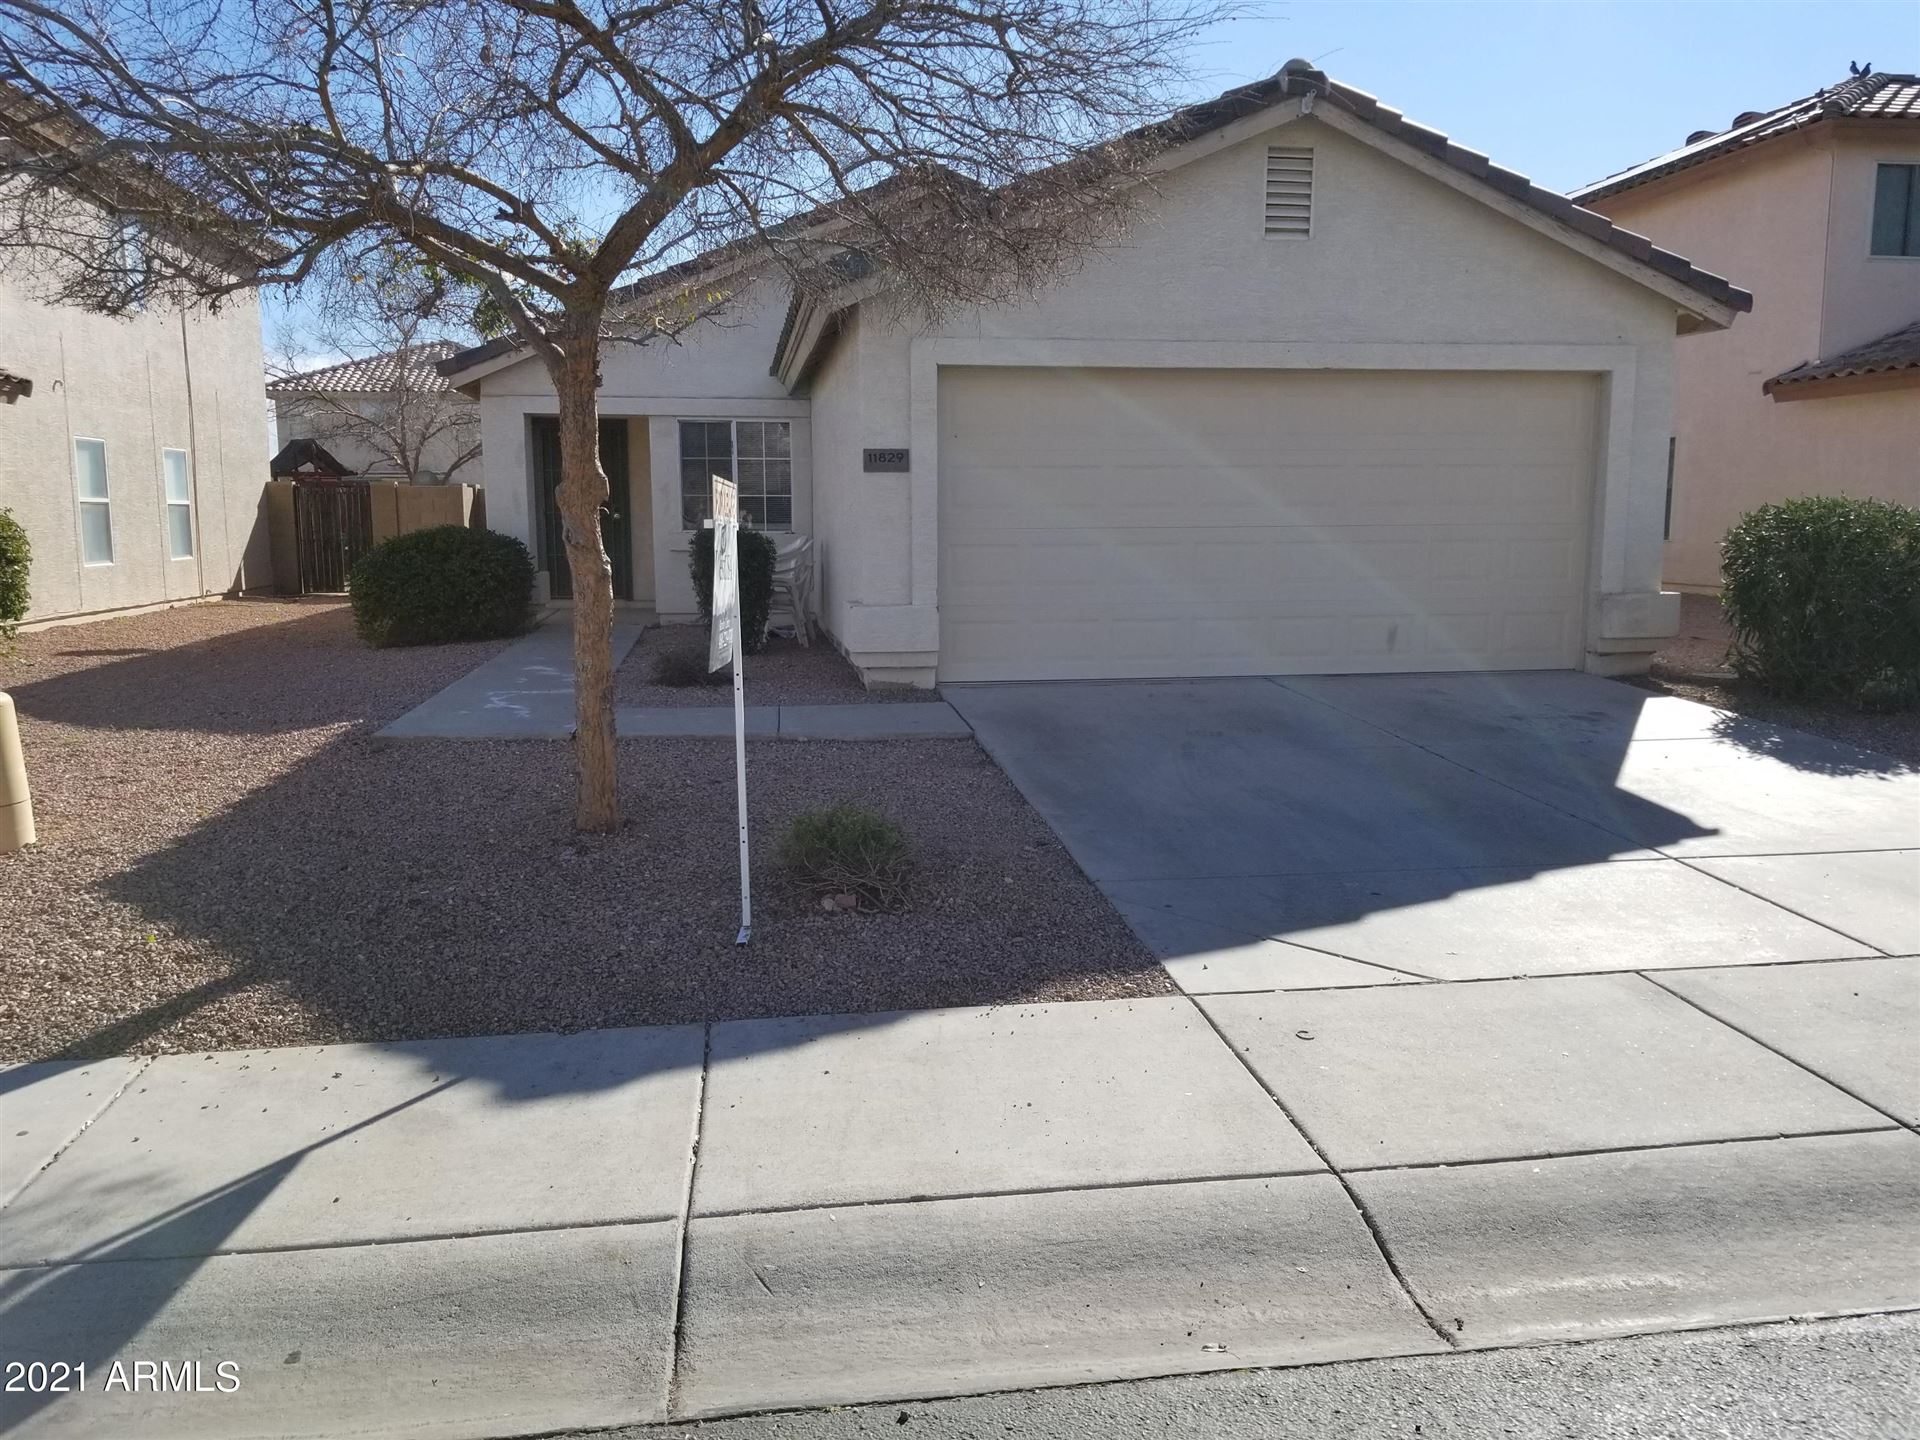 Photo of 11829 W SUNNYSIDE Drive, El Mirage, AZ 85335 (MLS # 6199839)